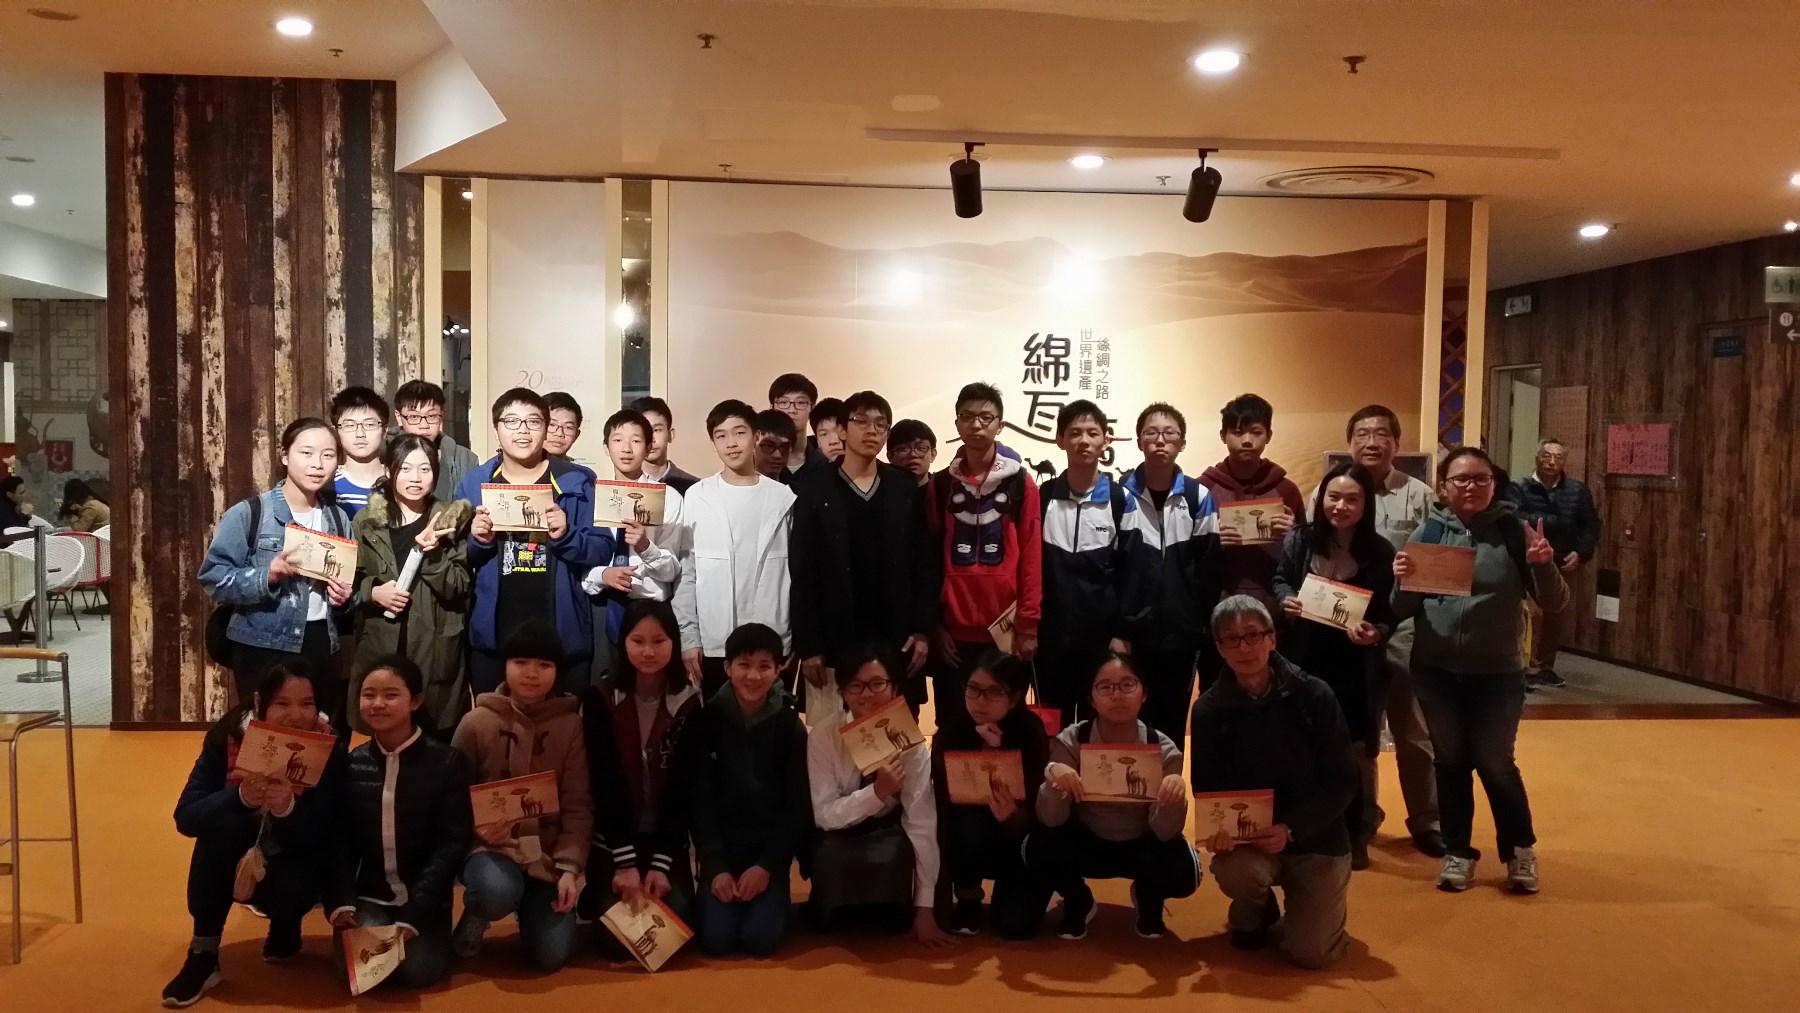 http://npc.edu.hk/sites/default/files/20171222_140554.jpg